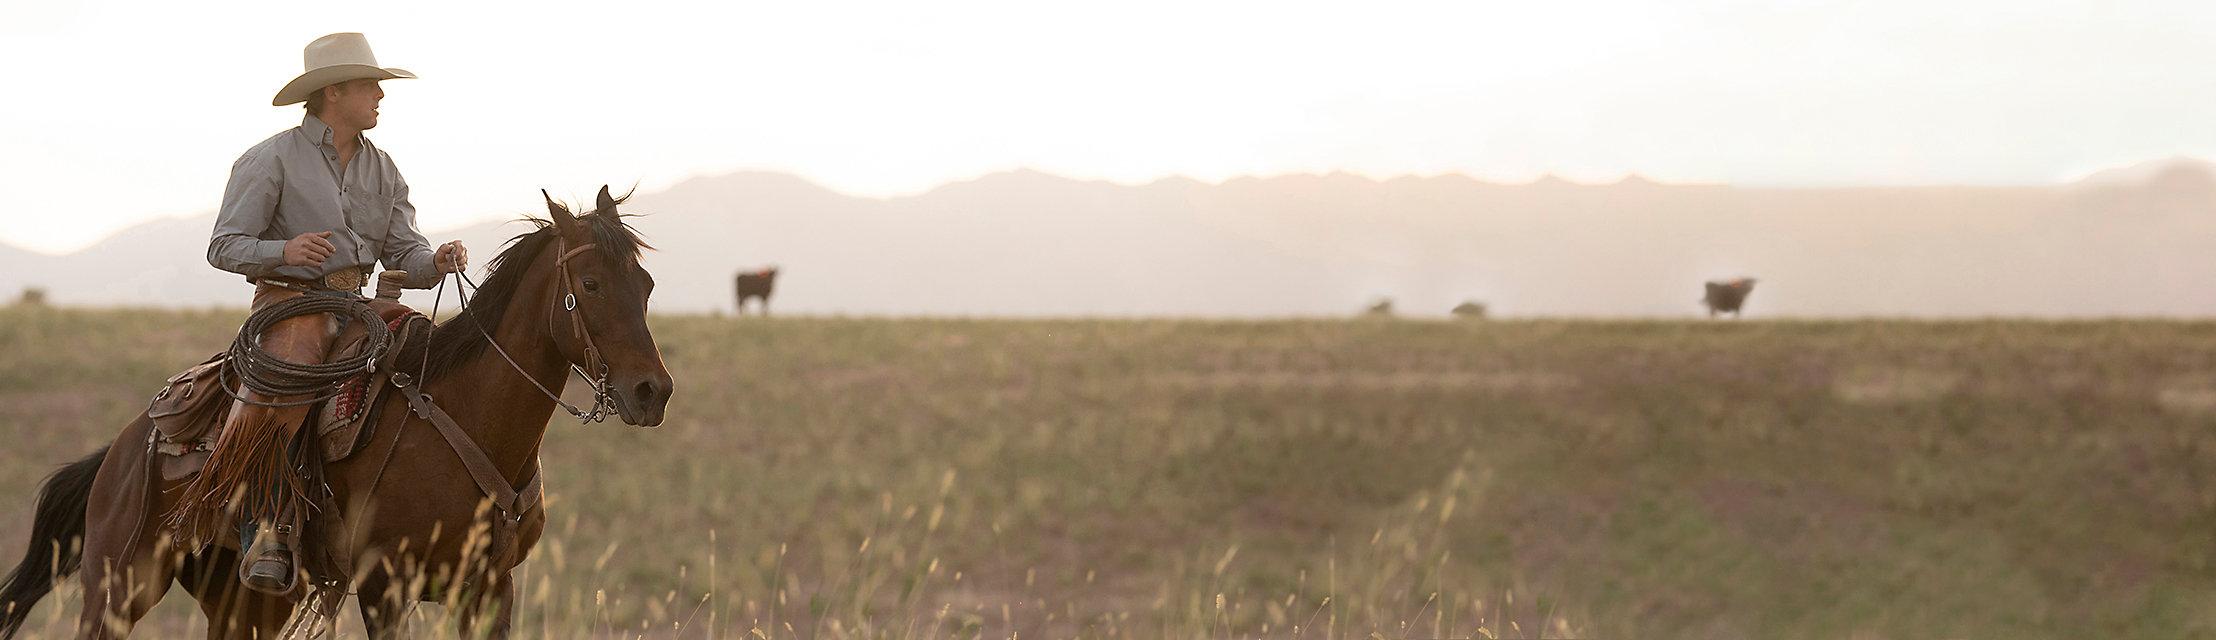 SHOP RODEO | Wrangler